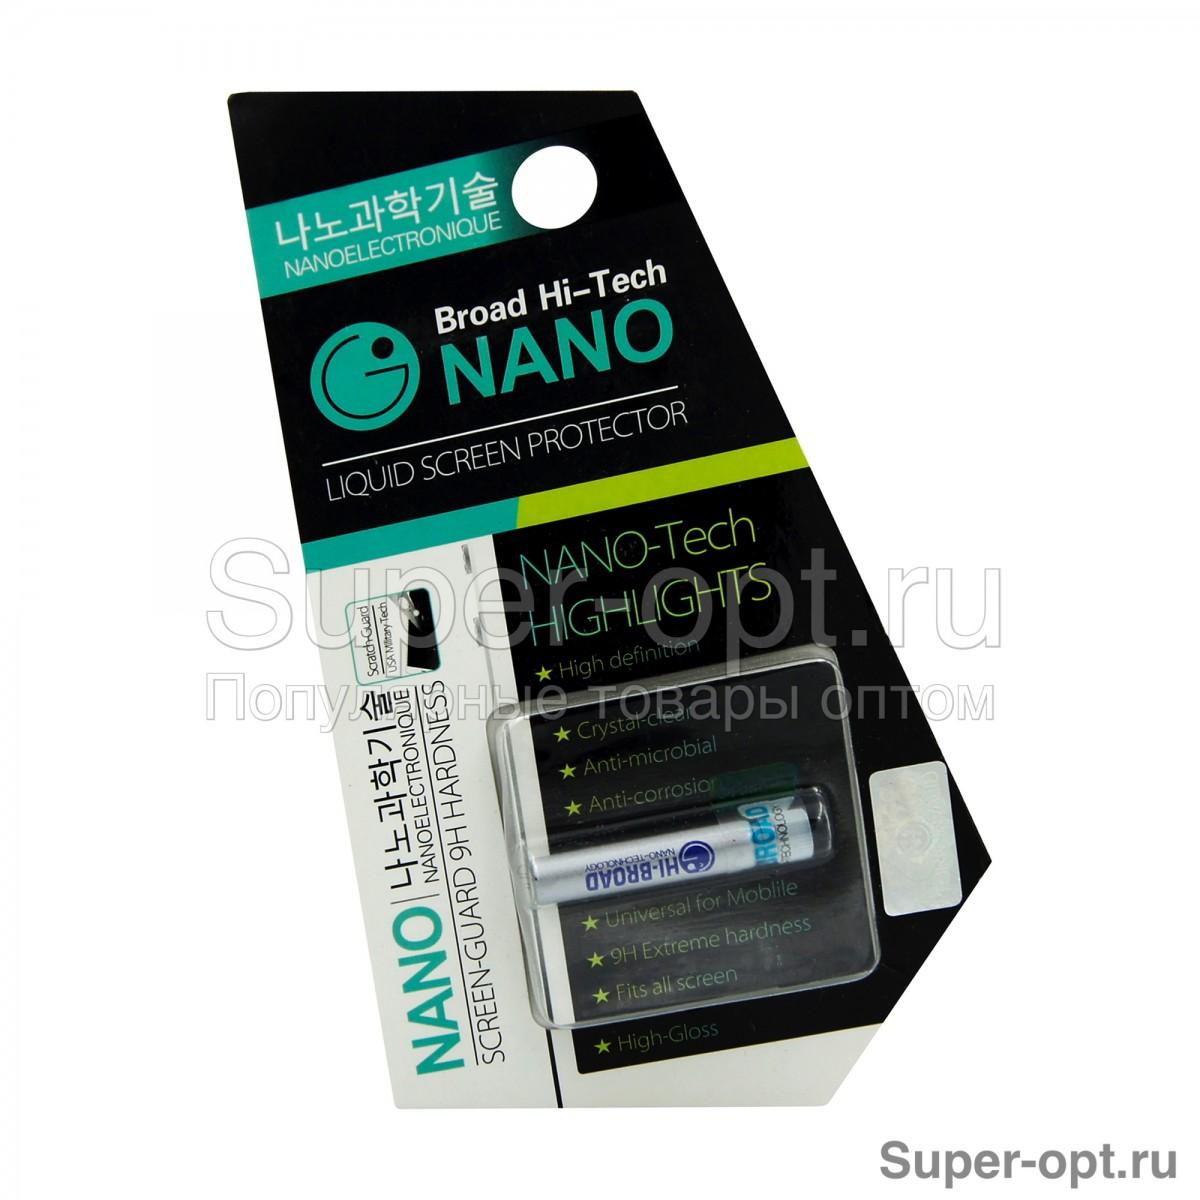 Жидкая защита экрана Broad Hi-Tech NANO оптом